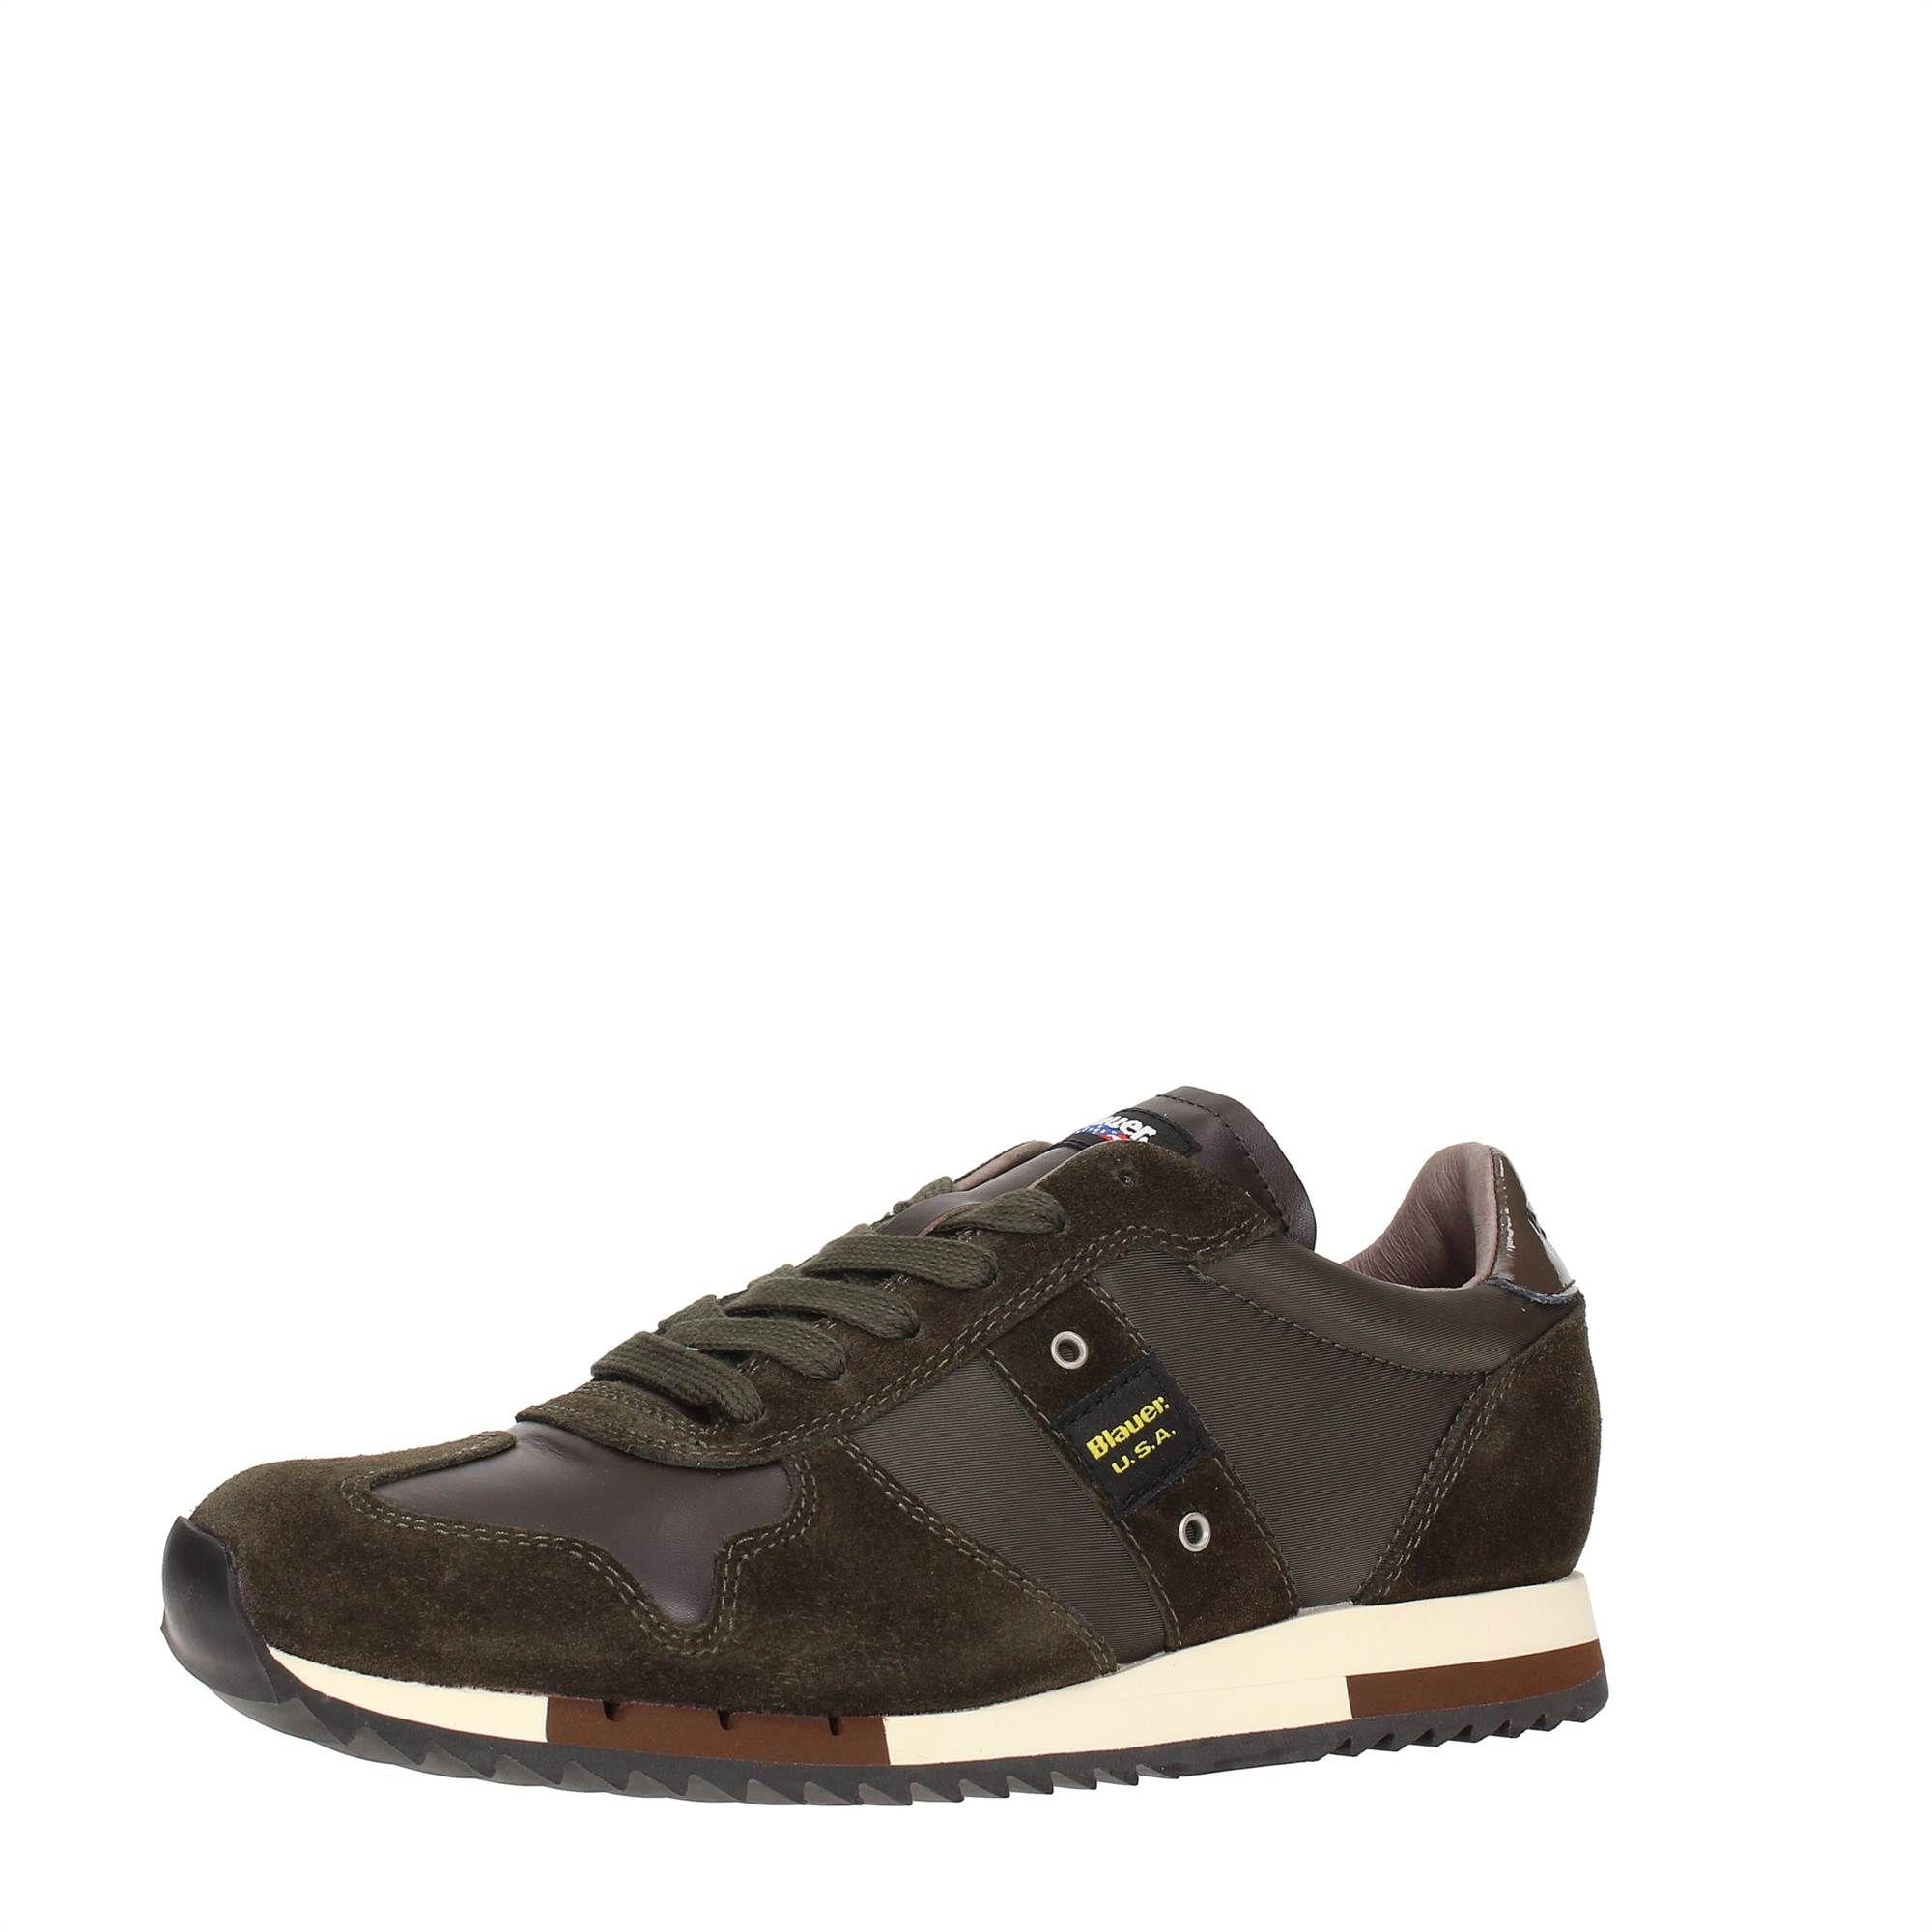 Blauer USA 6FRUNLOW/TAS Green Footwear Men Sneakers